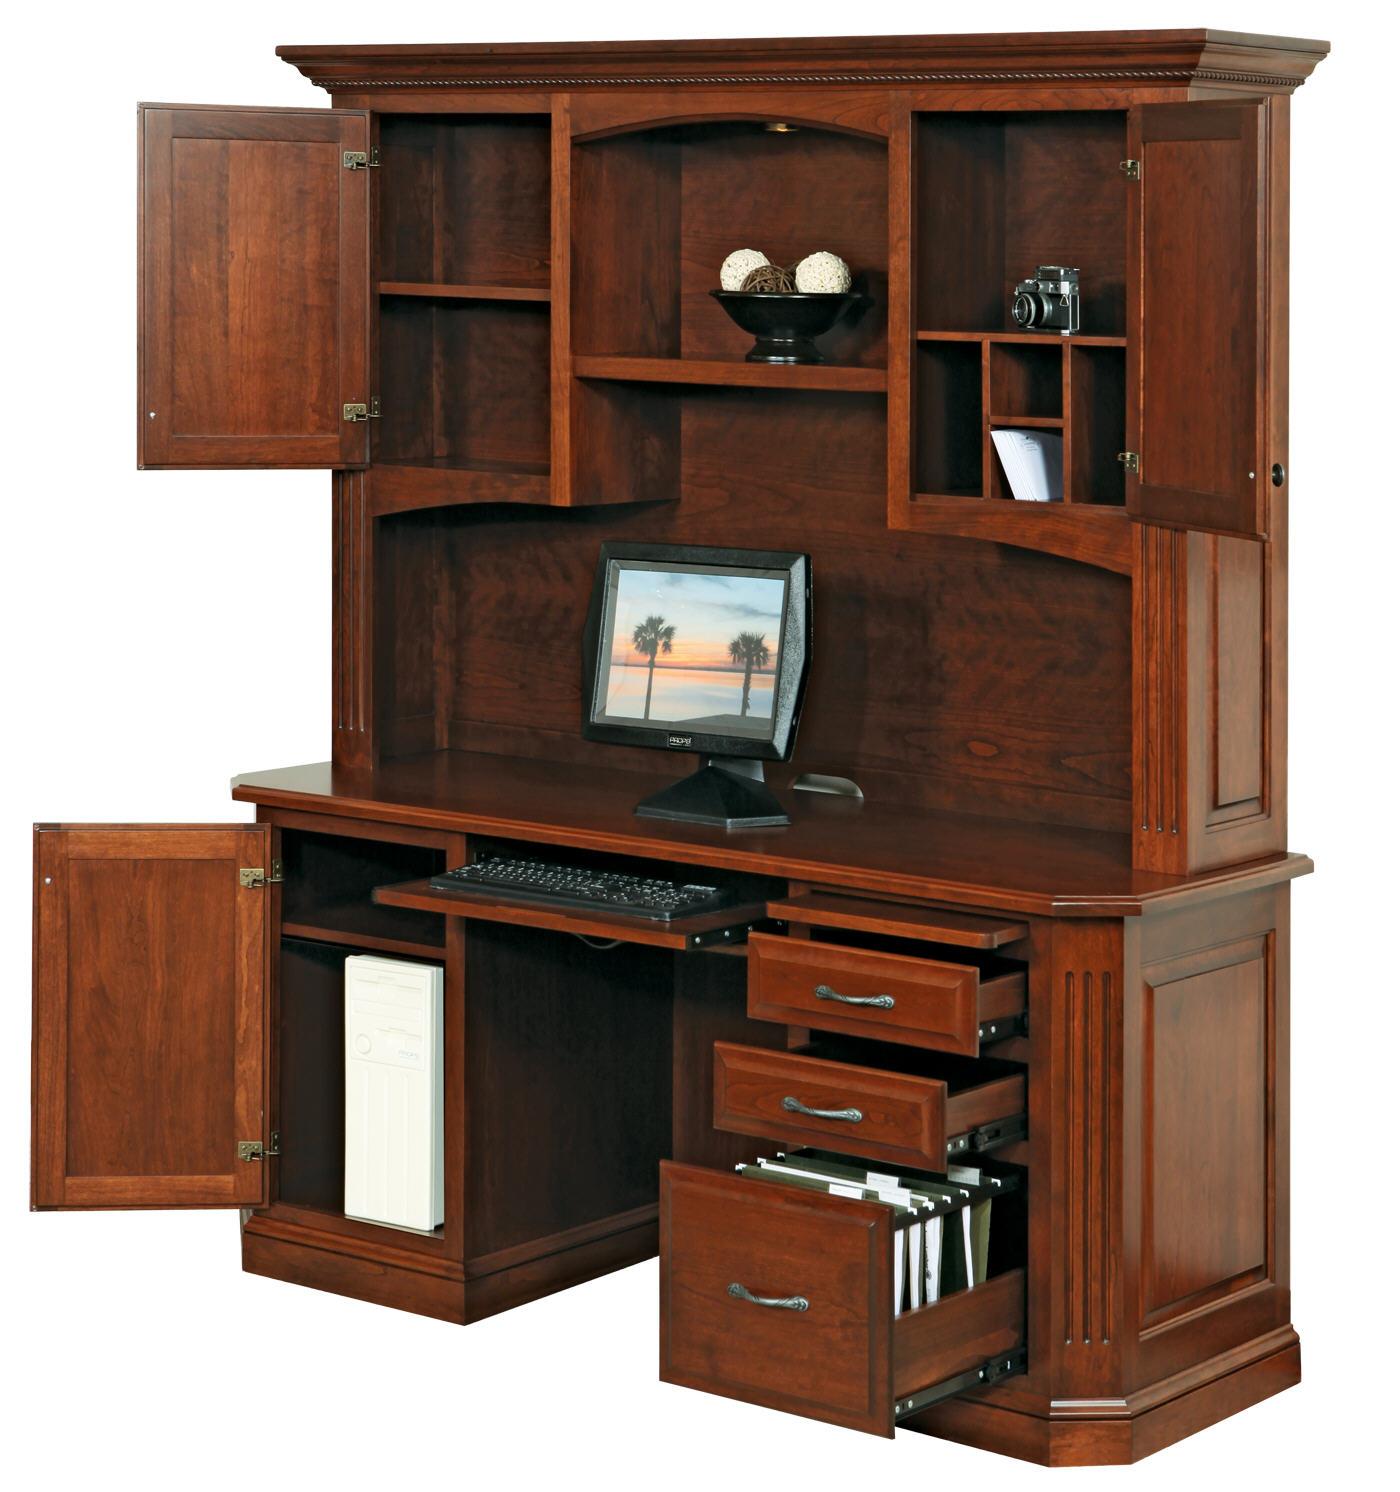 112 63 office furniture desks stone barn furnishings inc